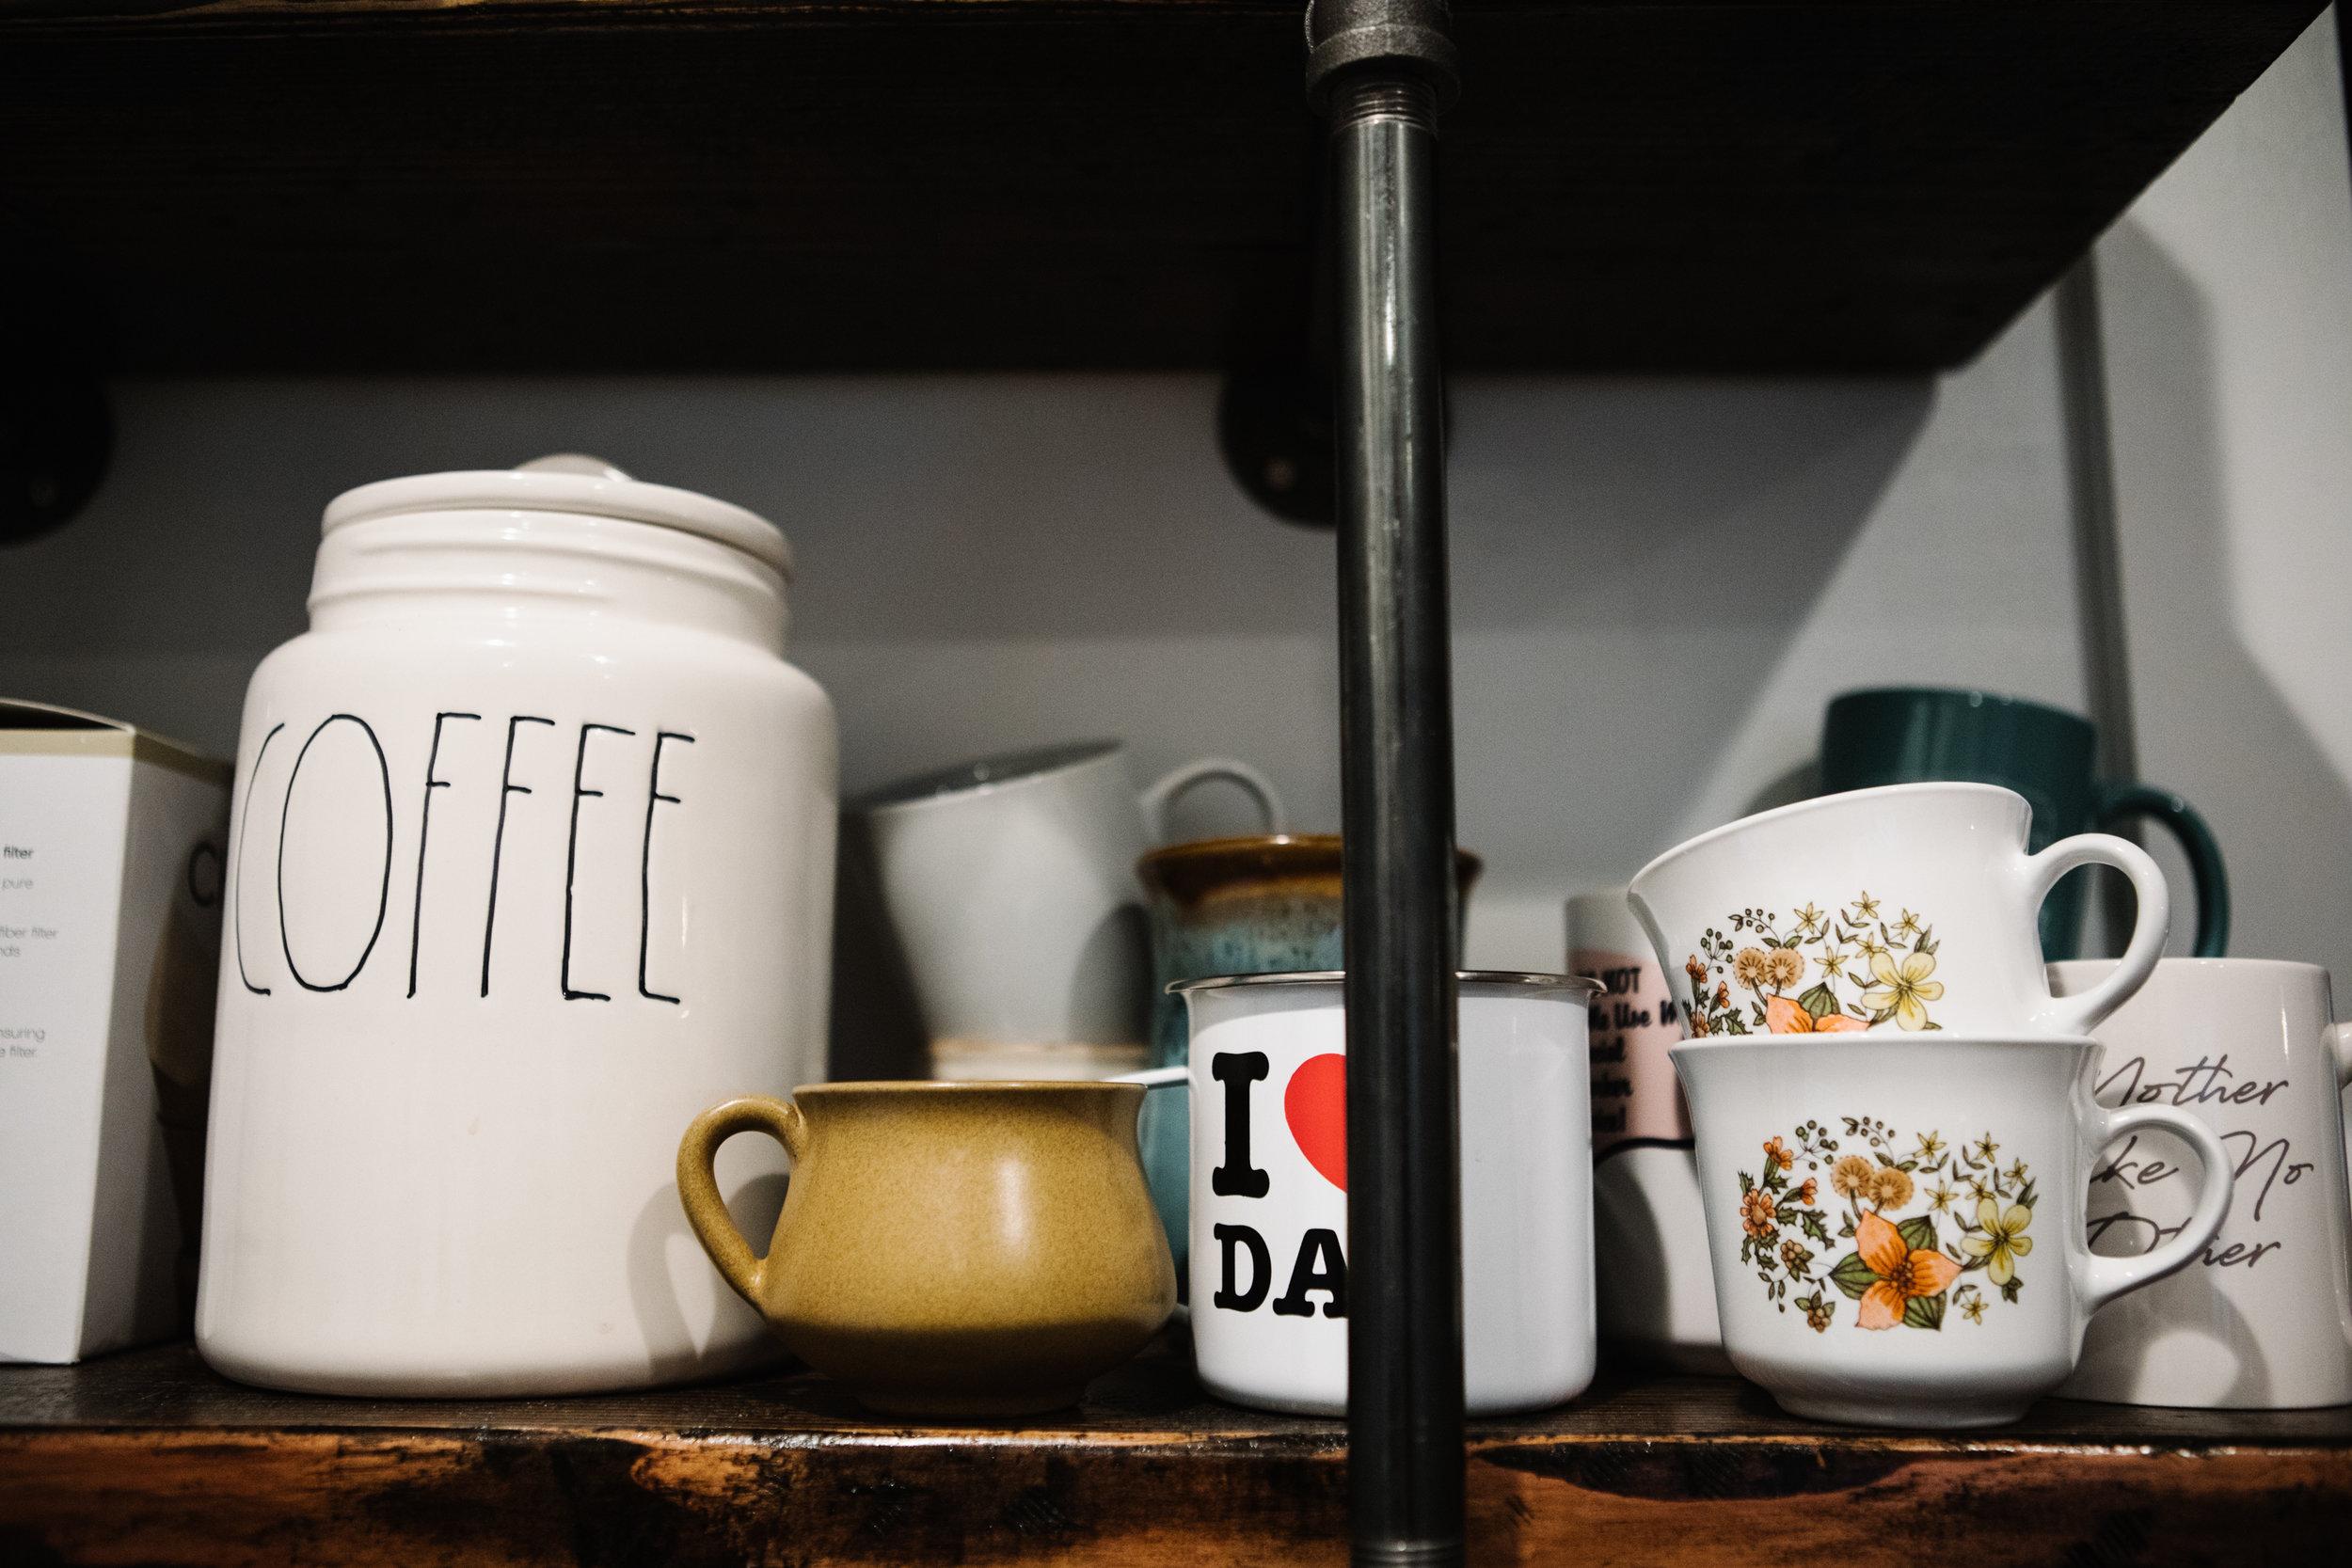 Coffee mugs on shelf